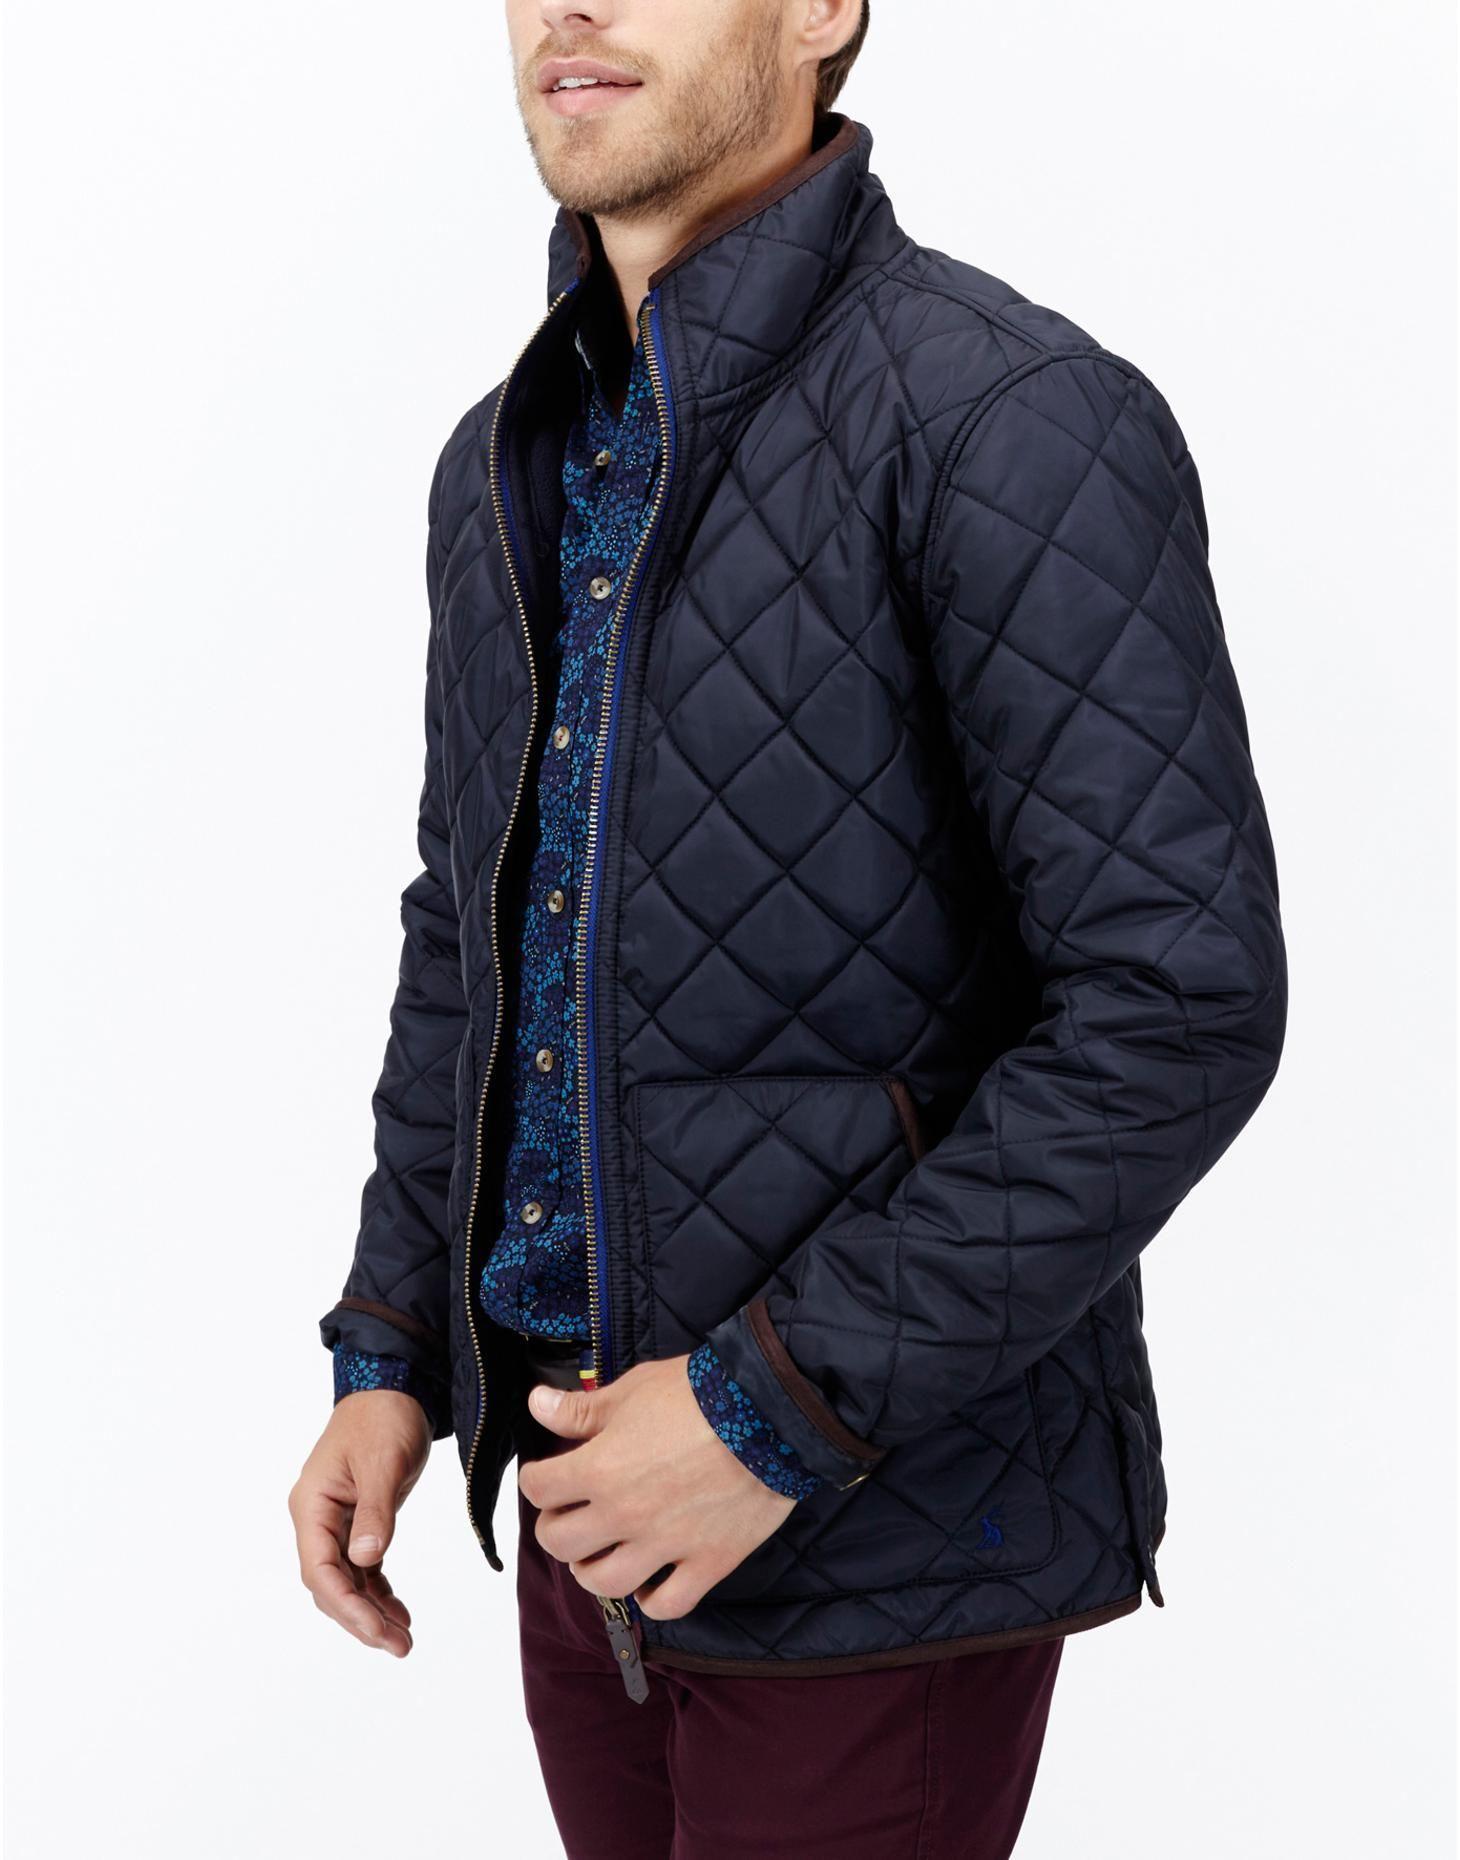 PENBURY Men's Quilted Jacket | Prep | Pinterest | Quilted jacket ... : quilted jackets mens - Adamdwight.com